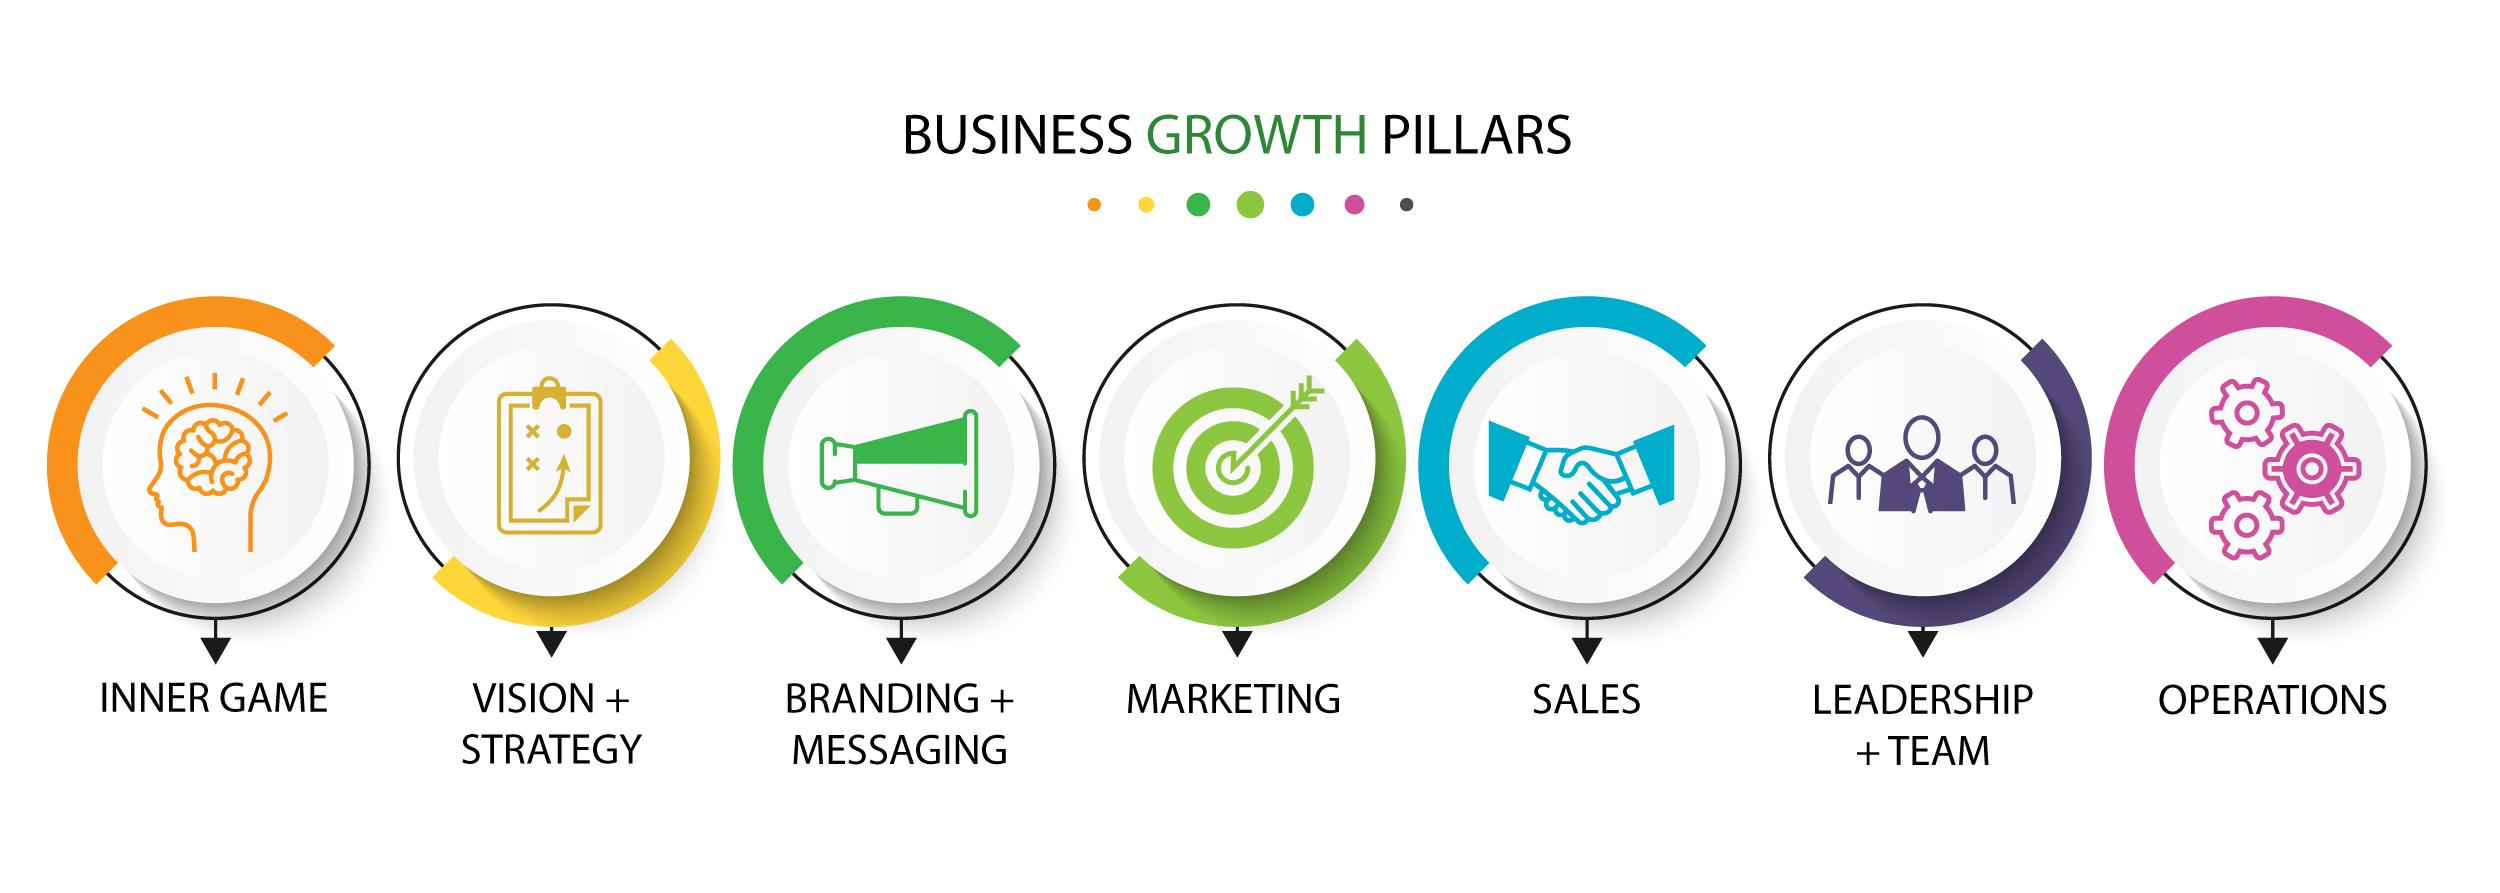 Growth Pillars